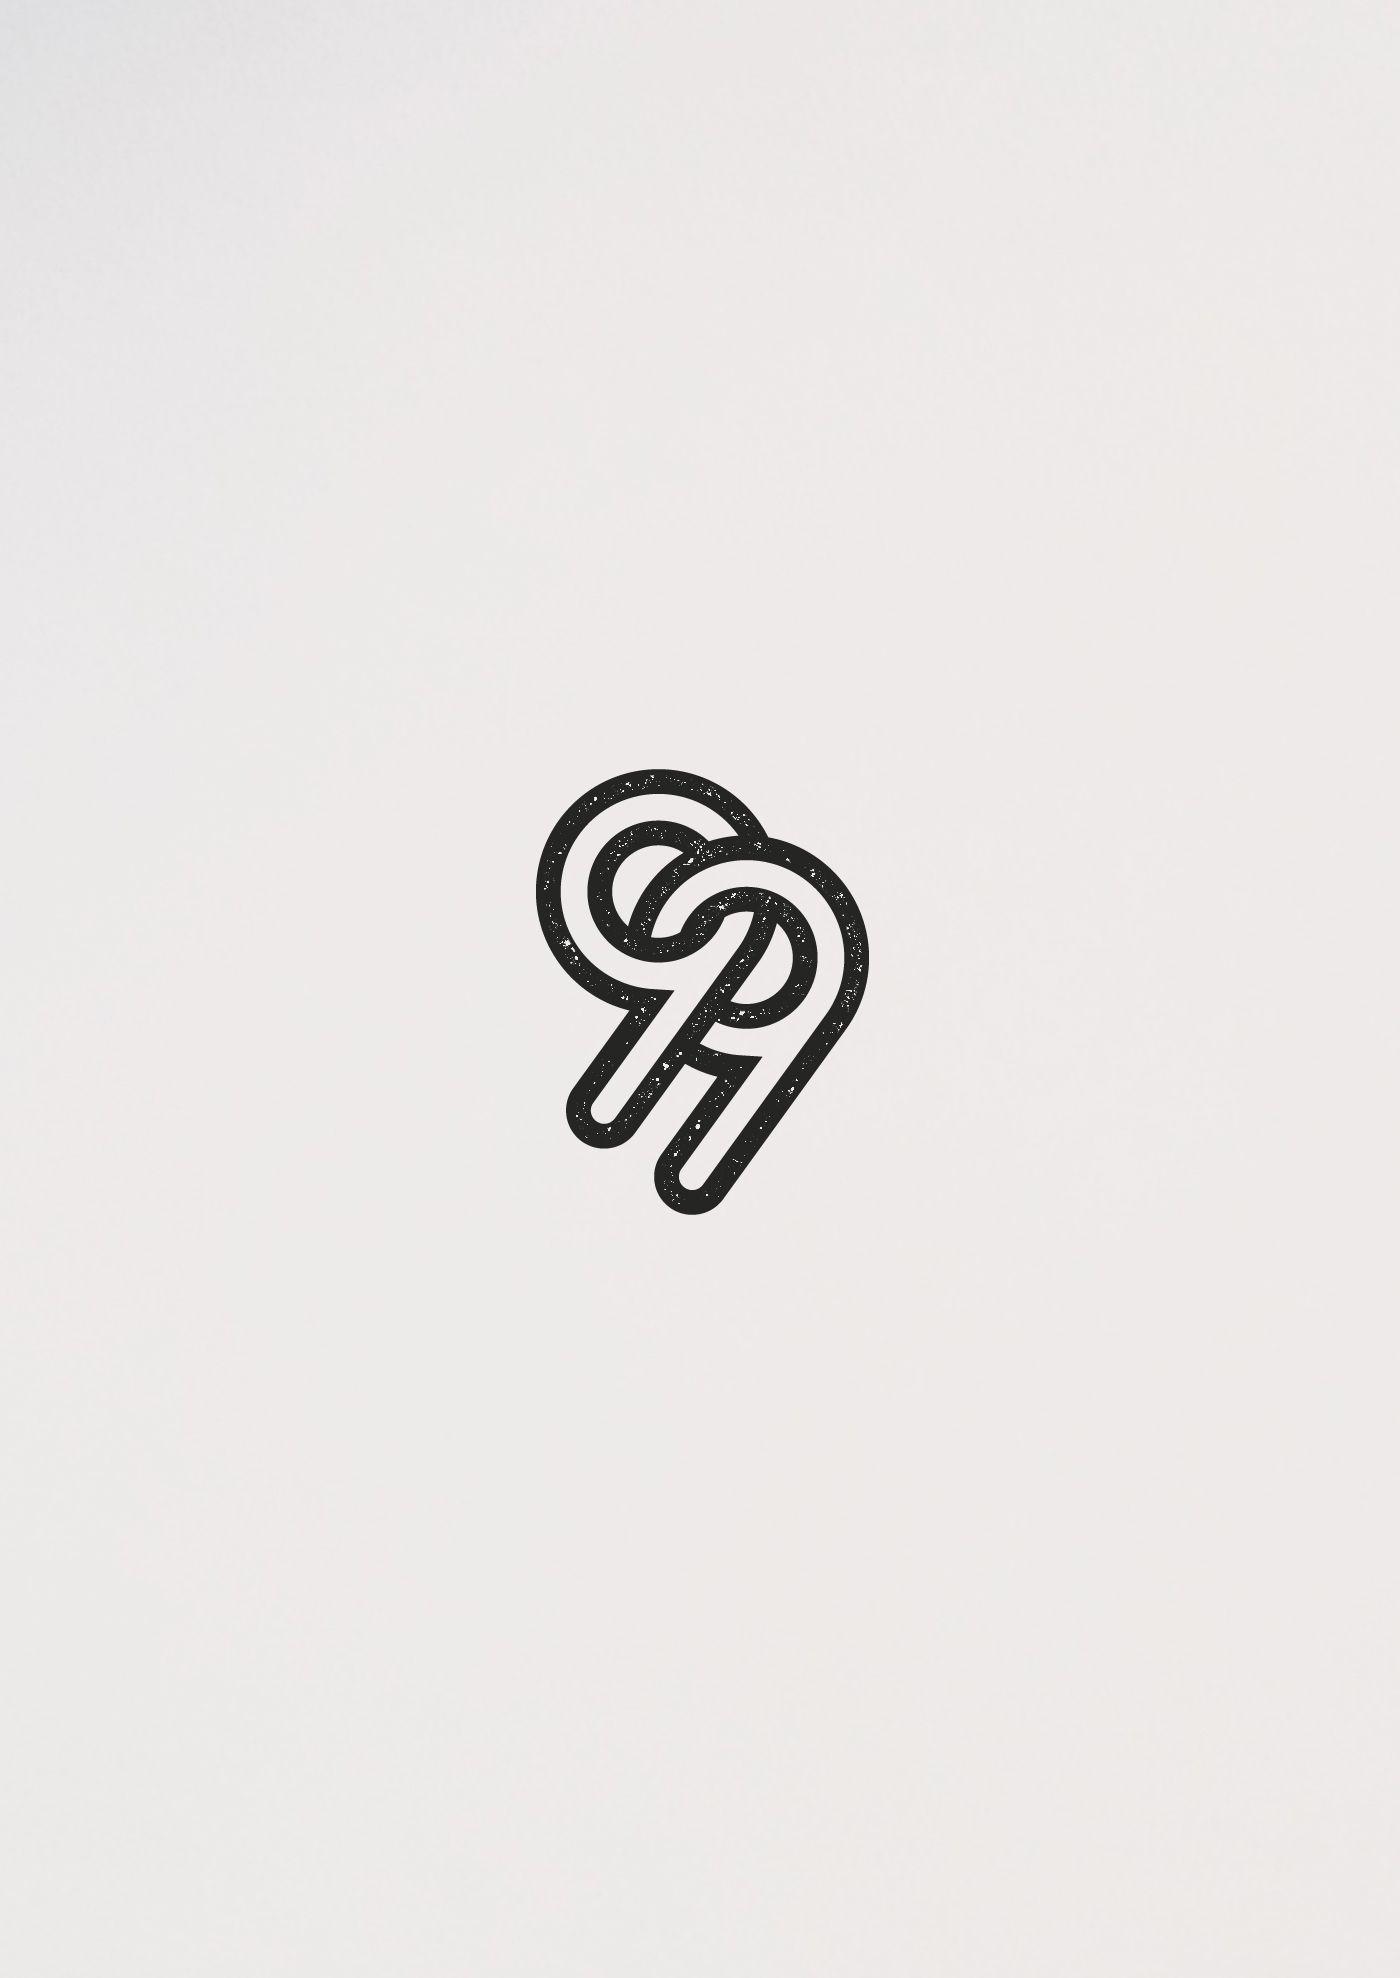 Visla Graphic Illustration And Logo Design Number 99 Desain